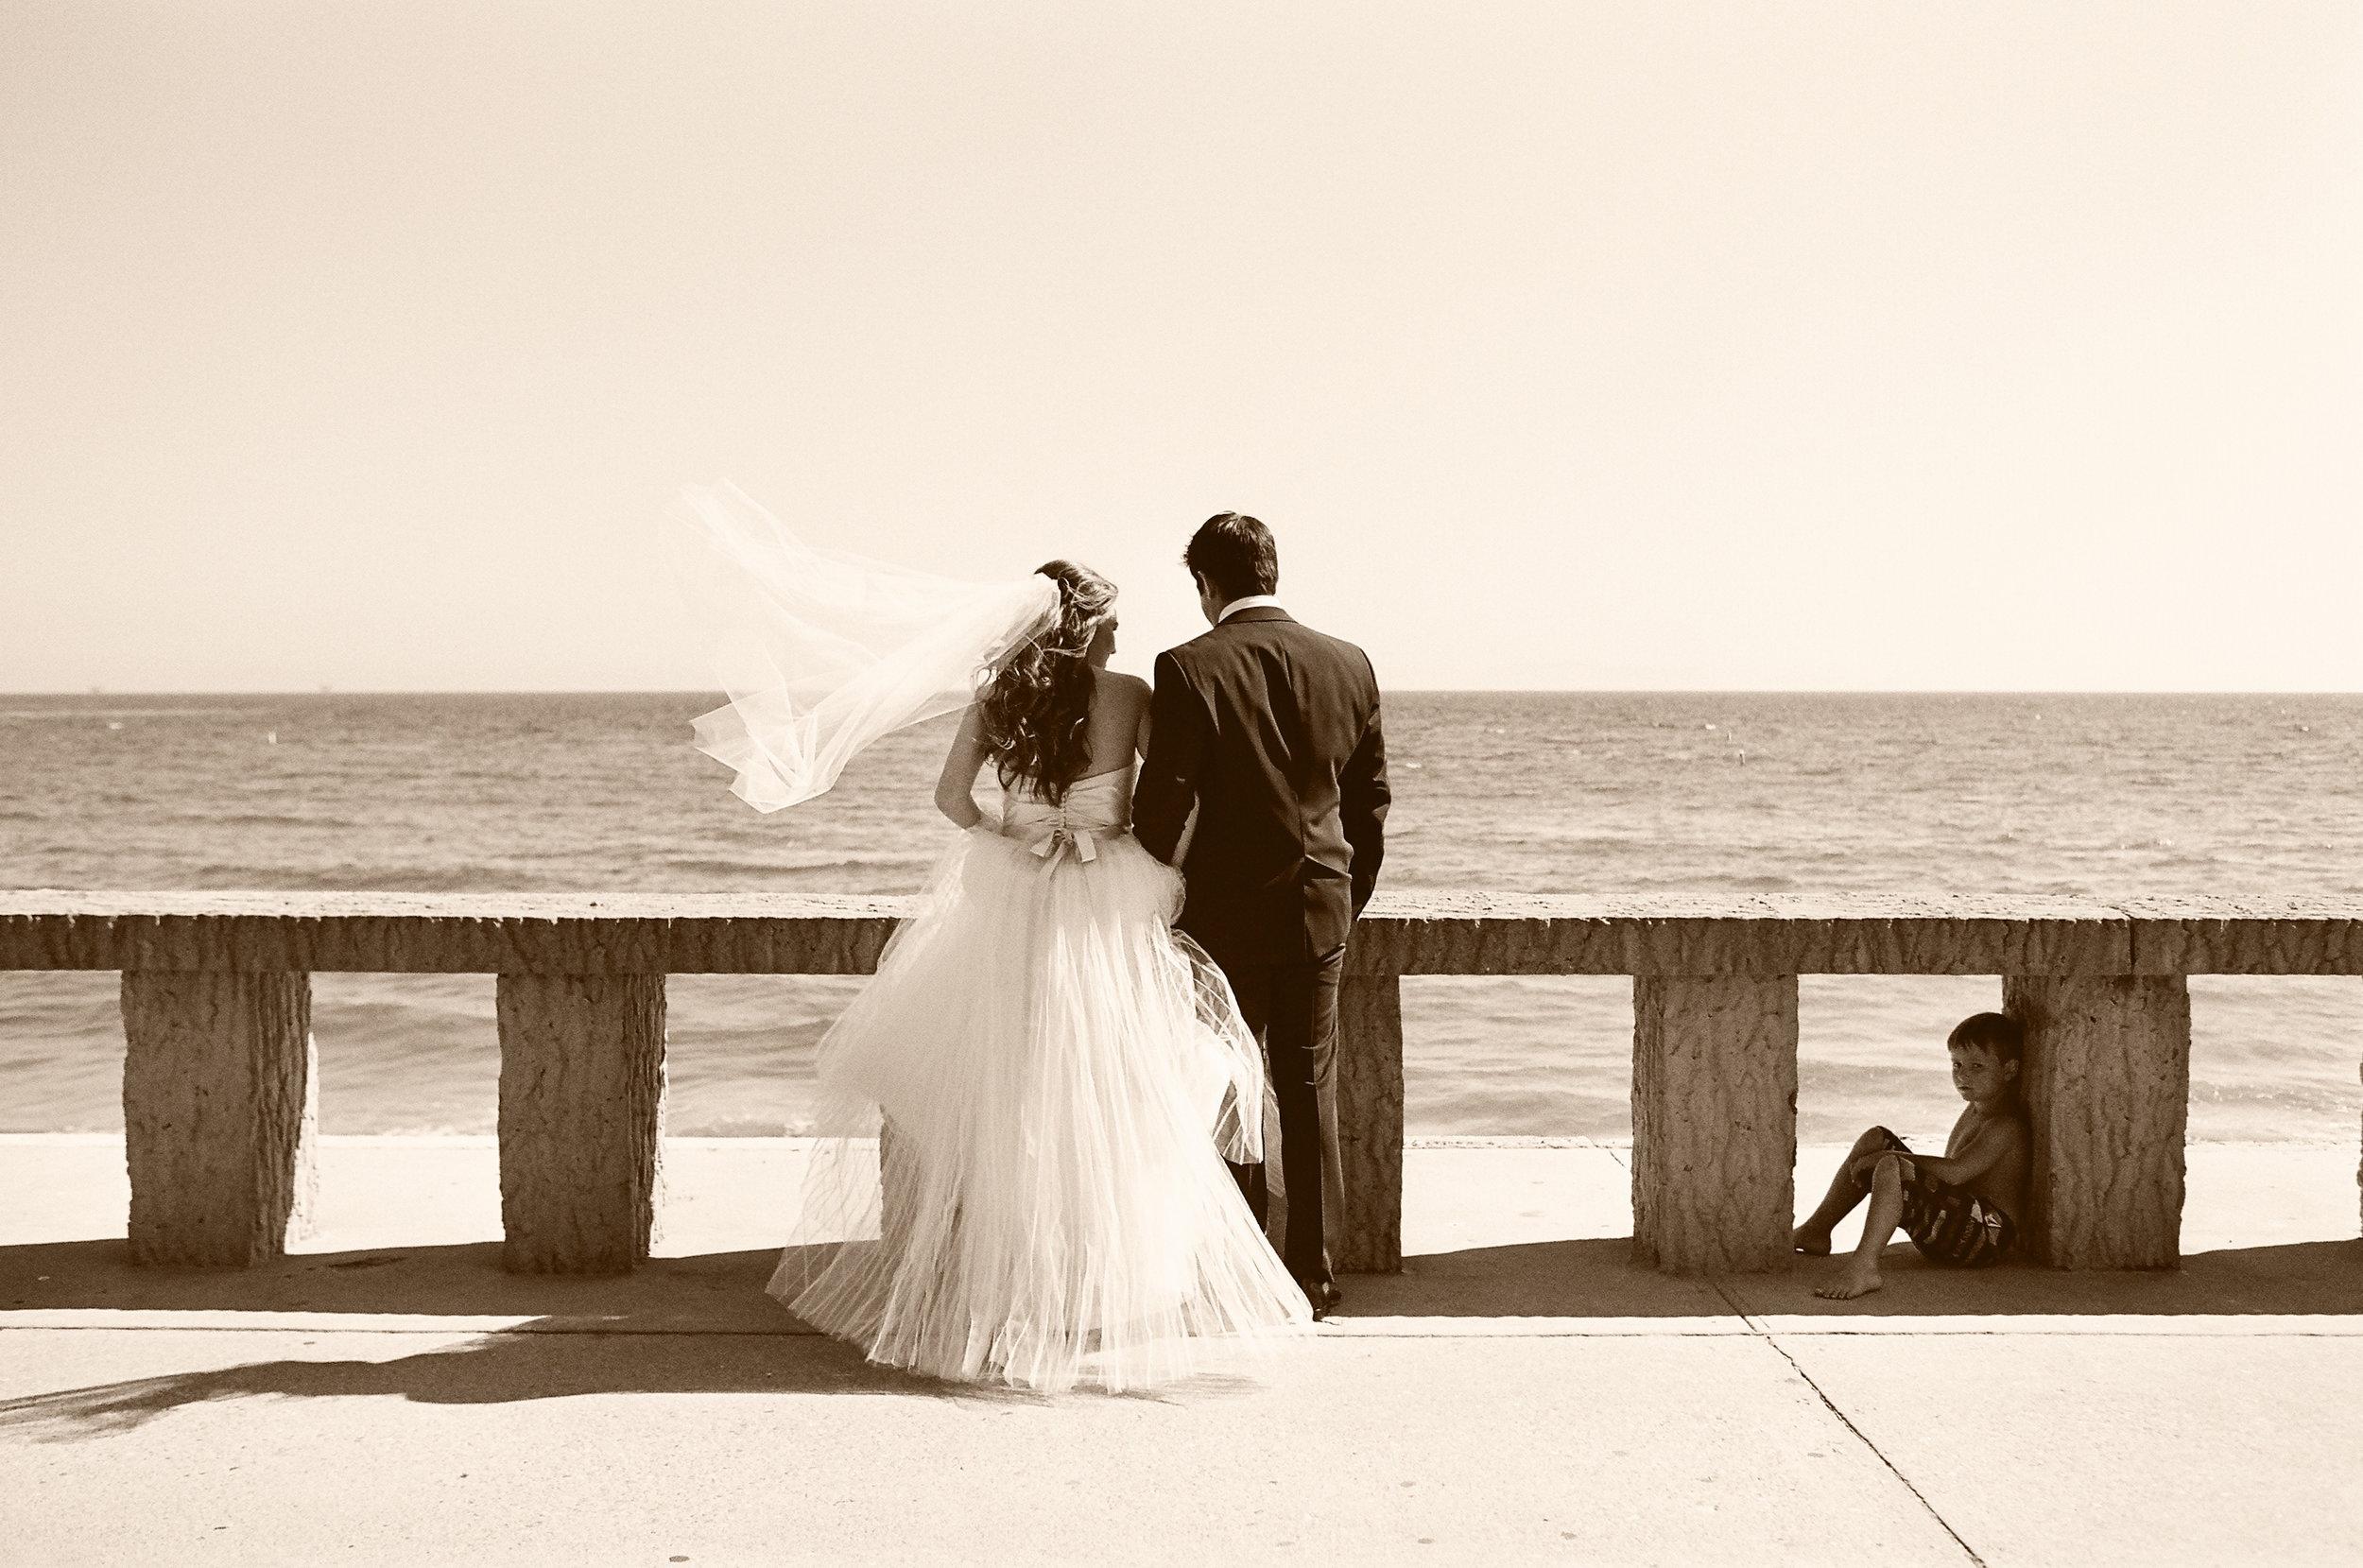 santabarbarawedding.com   Photographer: Beaux Arts Photographie   Santa Barbara Four Seasons Biltmore   Wedding Venue